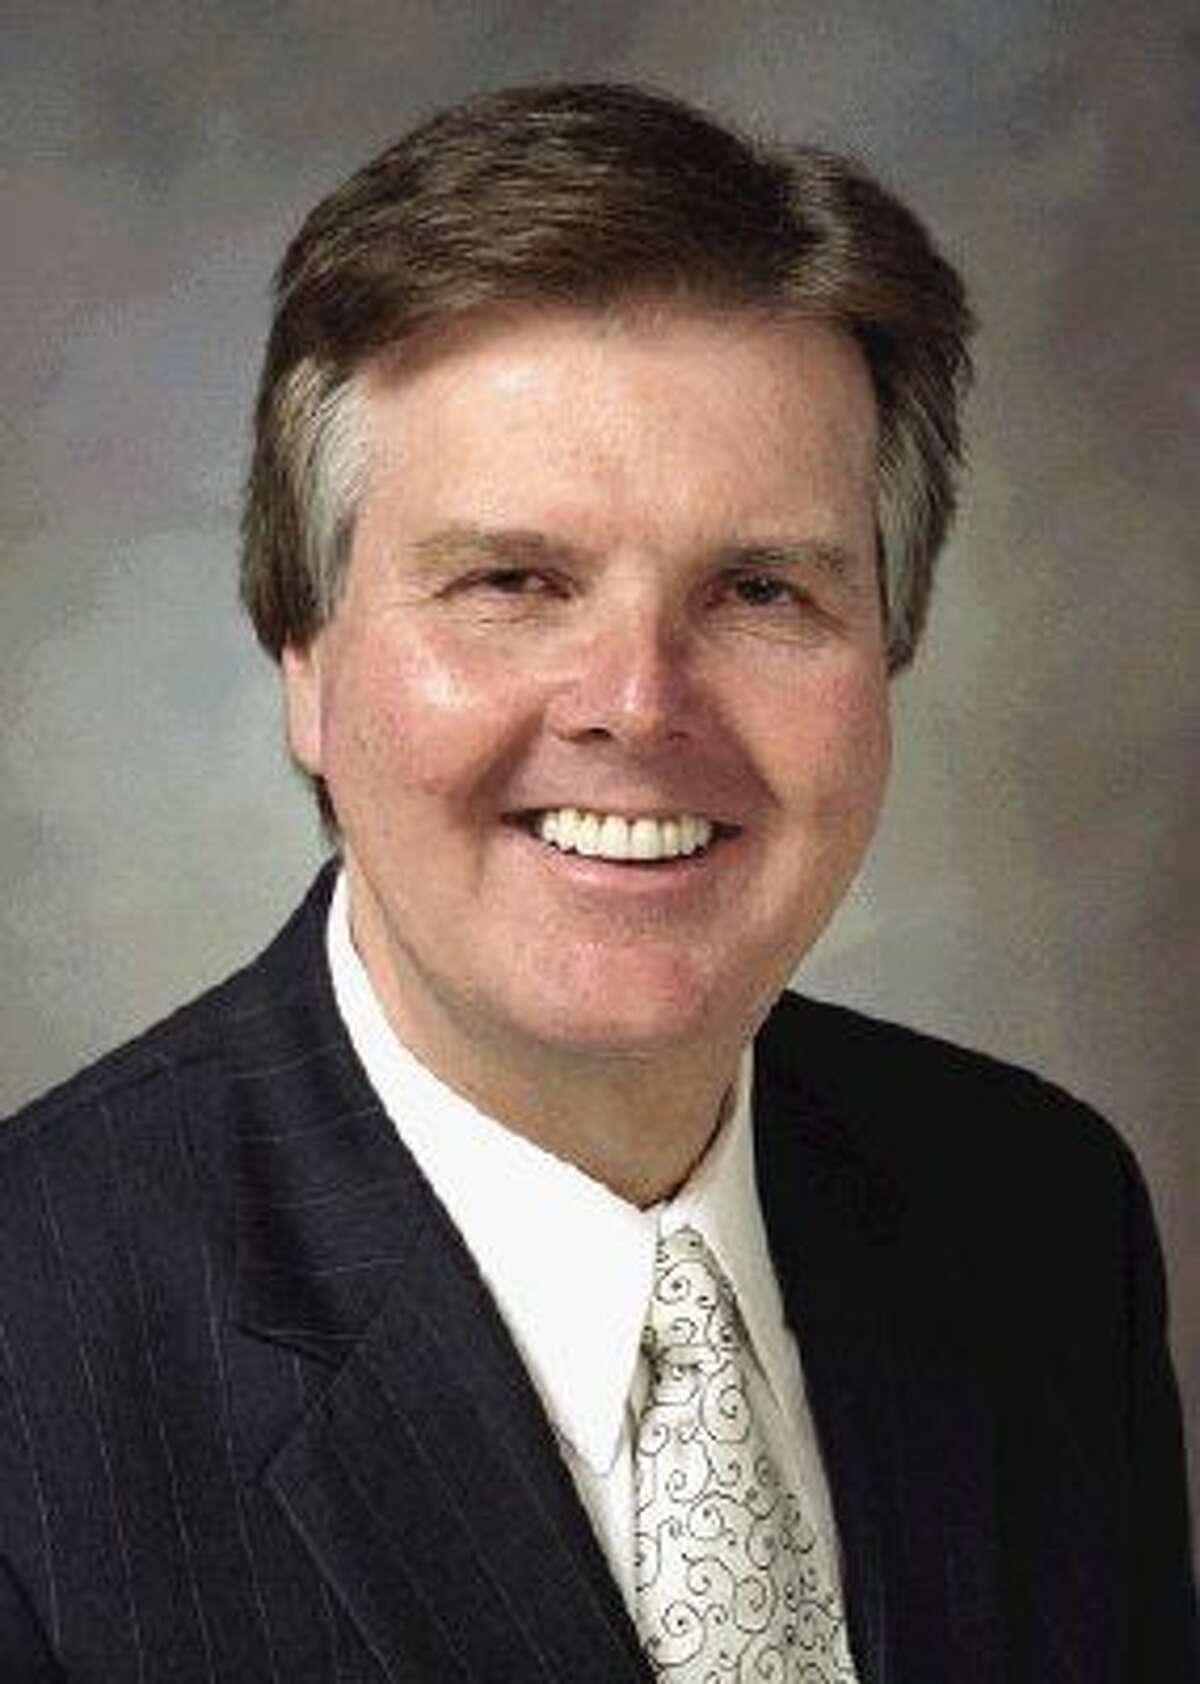 Lt. Governor-elect Dan Patrick